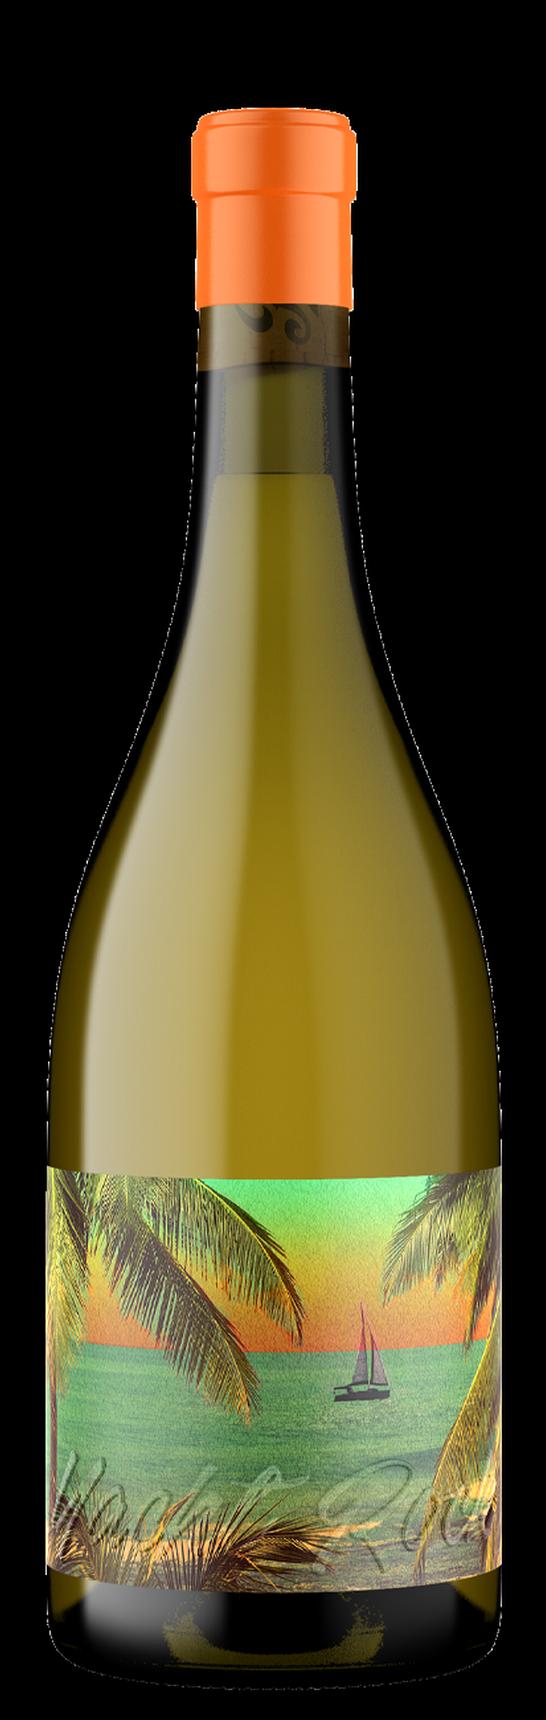 2018 Yacht Rock, White Wine, Napa Valley